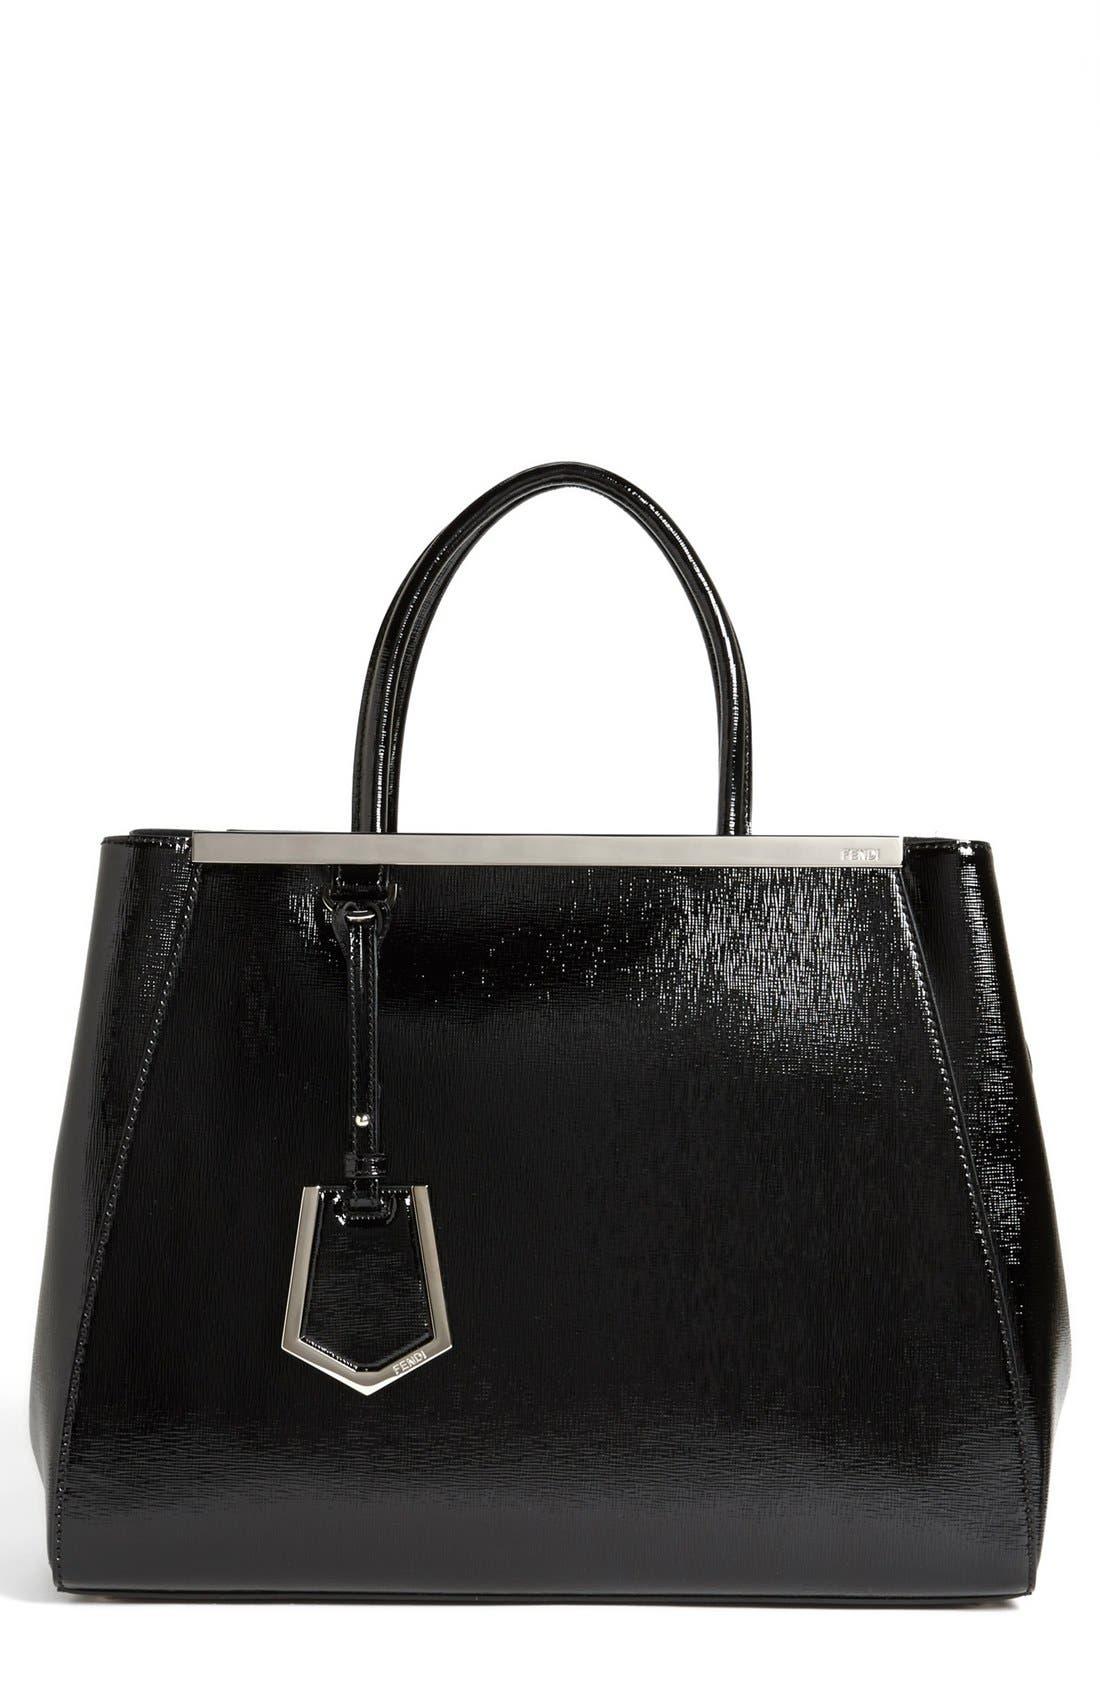 Main Image - Fendi 'Medium 2Jours' Leather Shopper